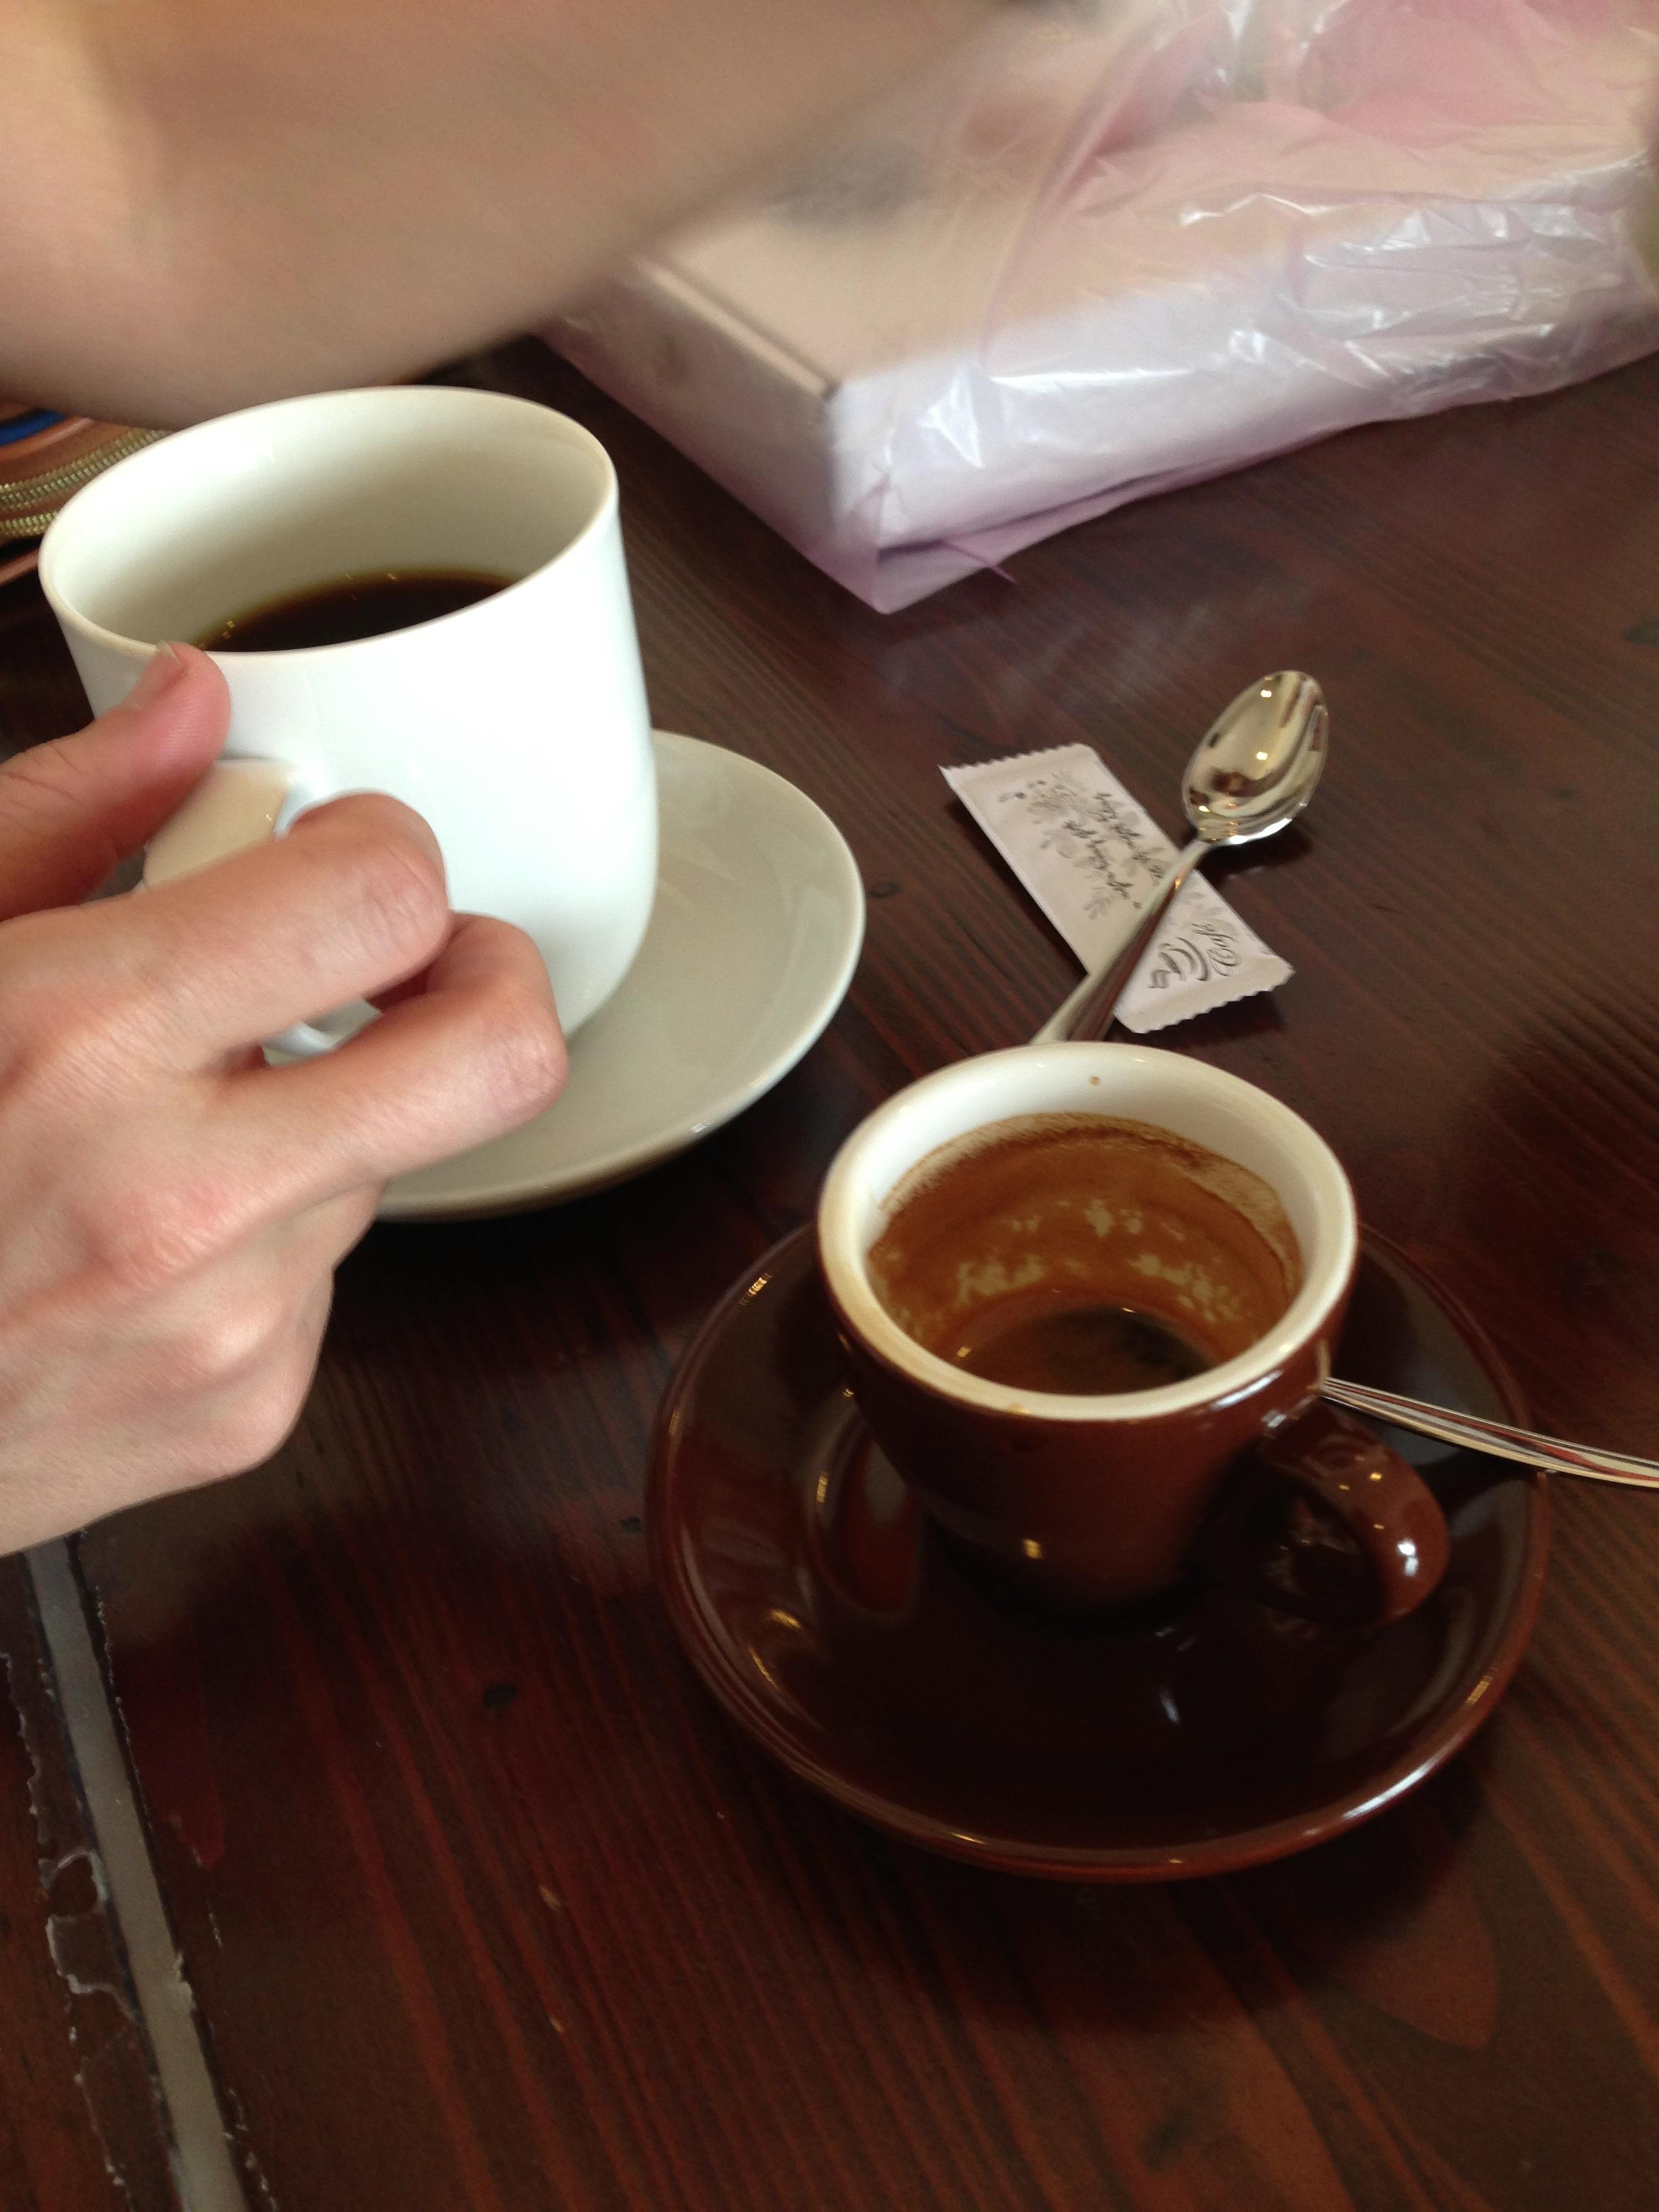 Imagine that, proper coffee mugs and demitasses!